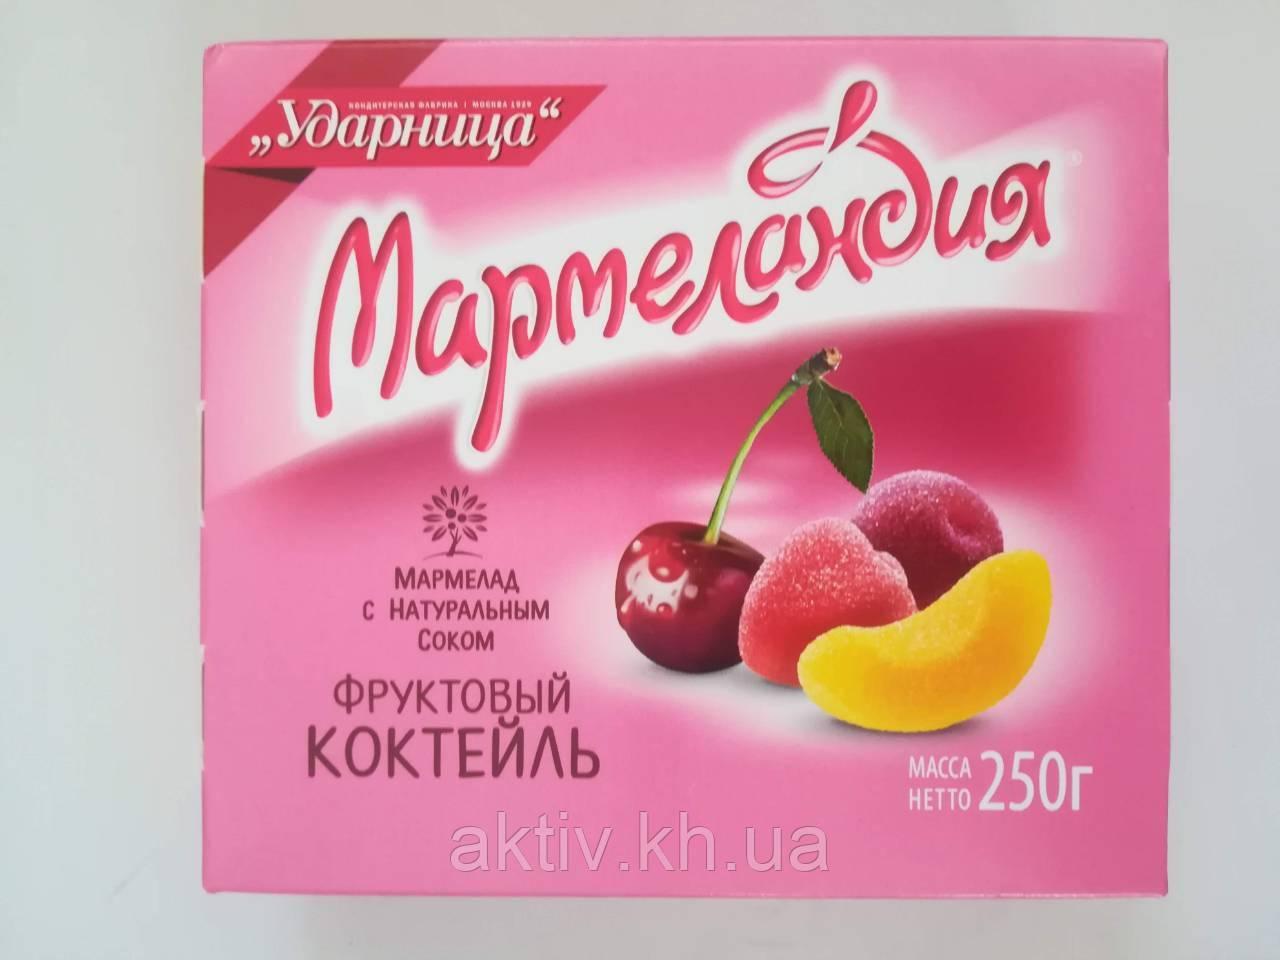 Мармеландия Фруктовый коктейль 250 грамм Ударница